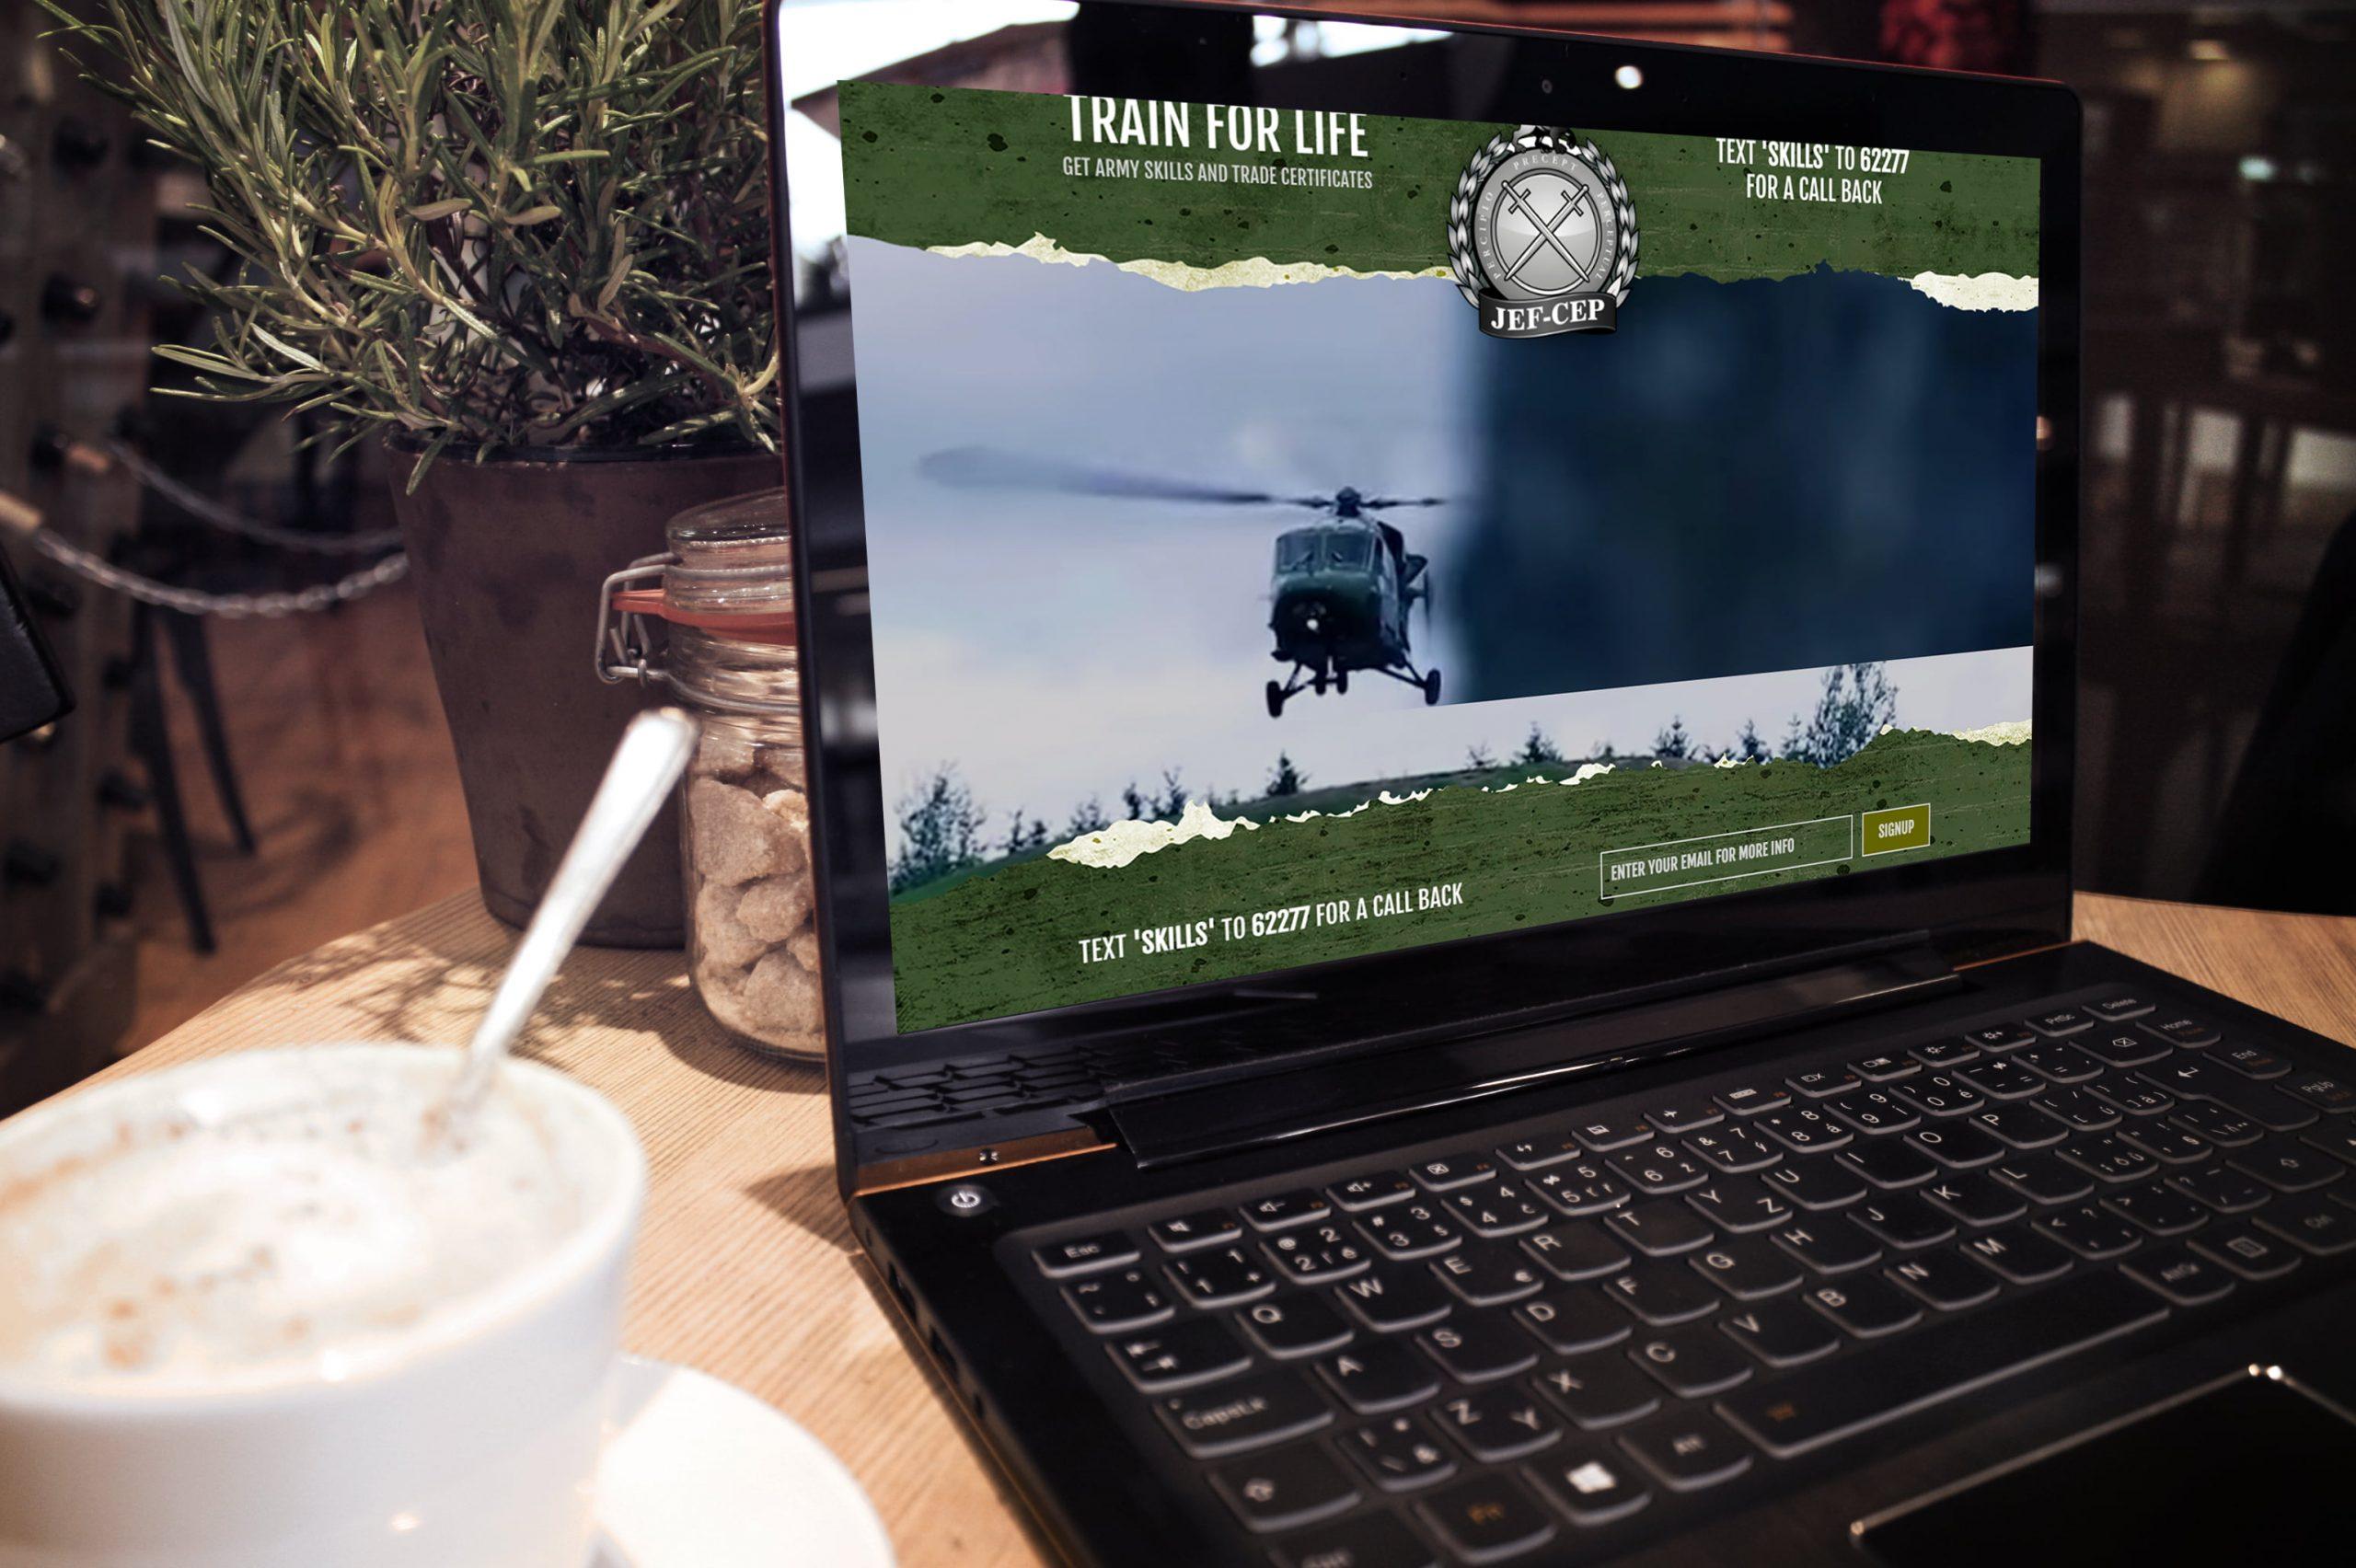 Jef-Cep website displayed on laptop